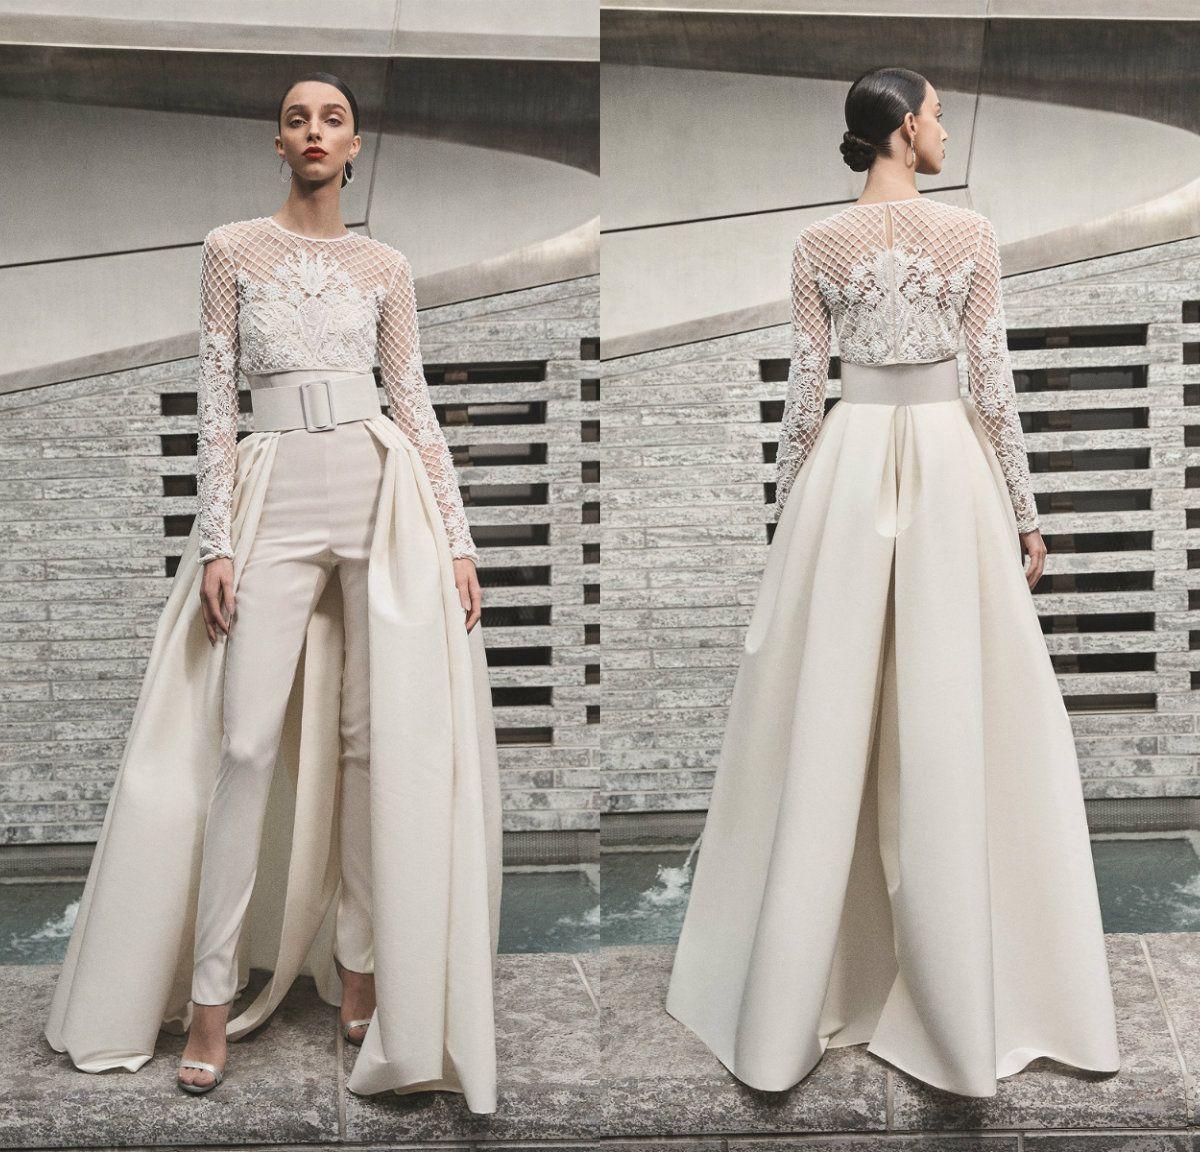 2019 Naeem Khan Plage Robes De Mariee Femmes Combinaisons Avec Jupe Amovible Mat Satin Sweetheart Pays Robes De Mariee Avec Veste